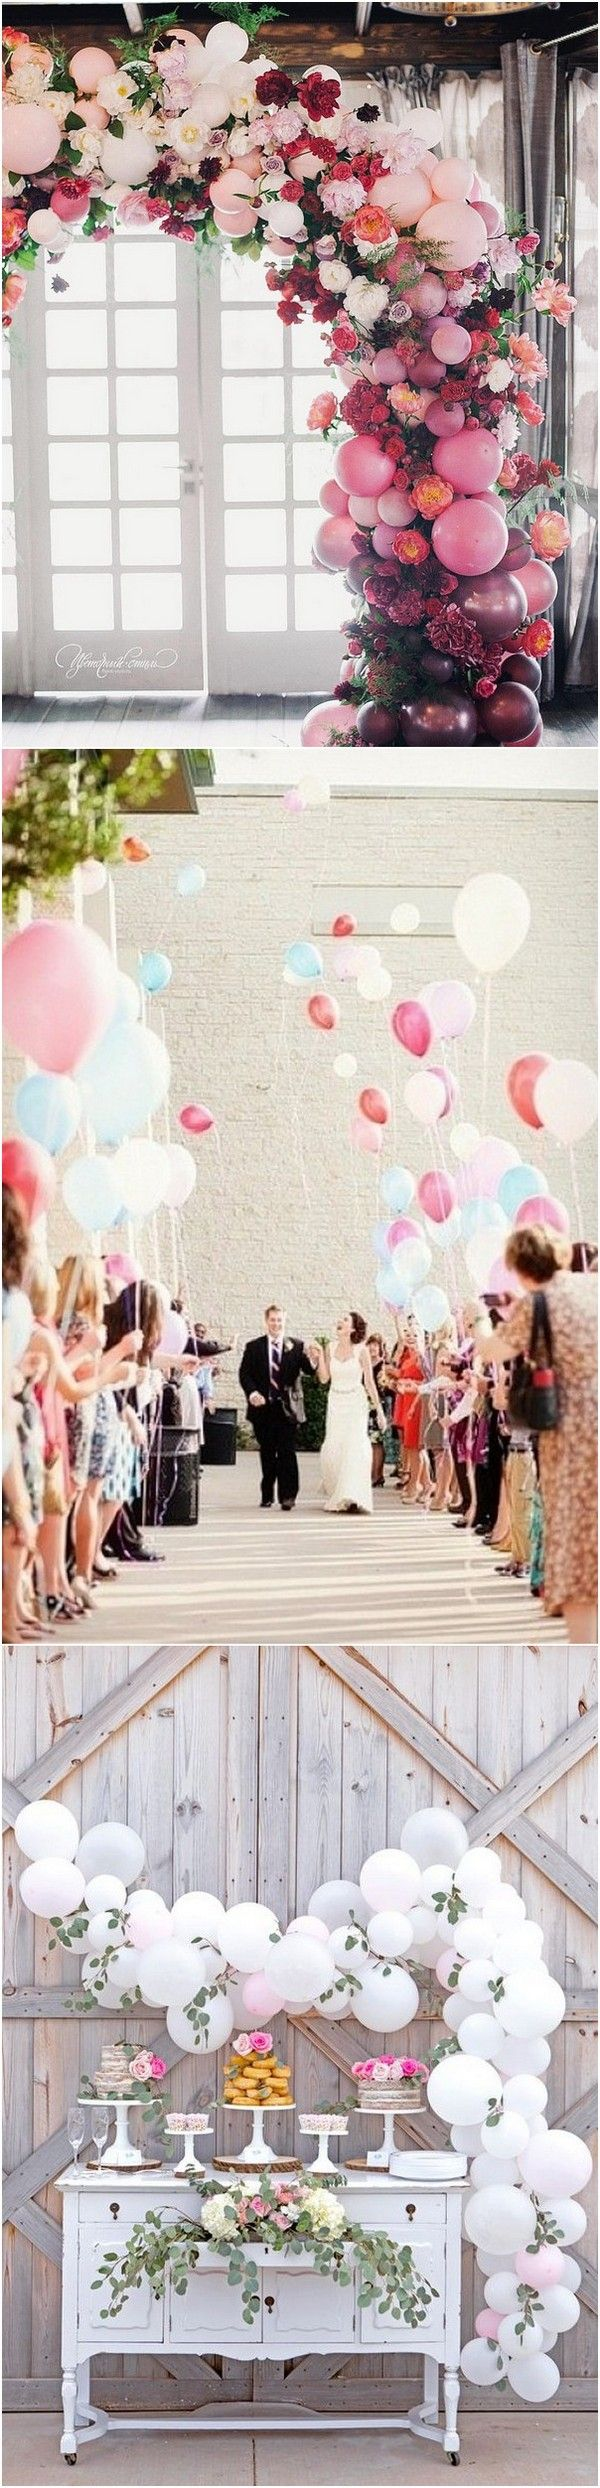 16 romantic wedding decoration ideas with balloons pinterest balloon wedding decoration ideas for dessert table junglespirit Choice Image